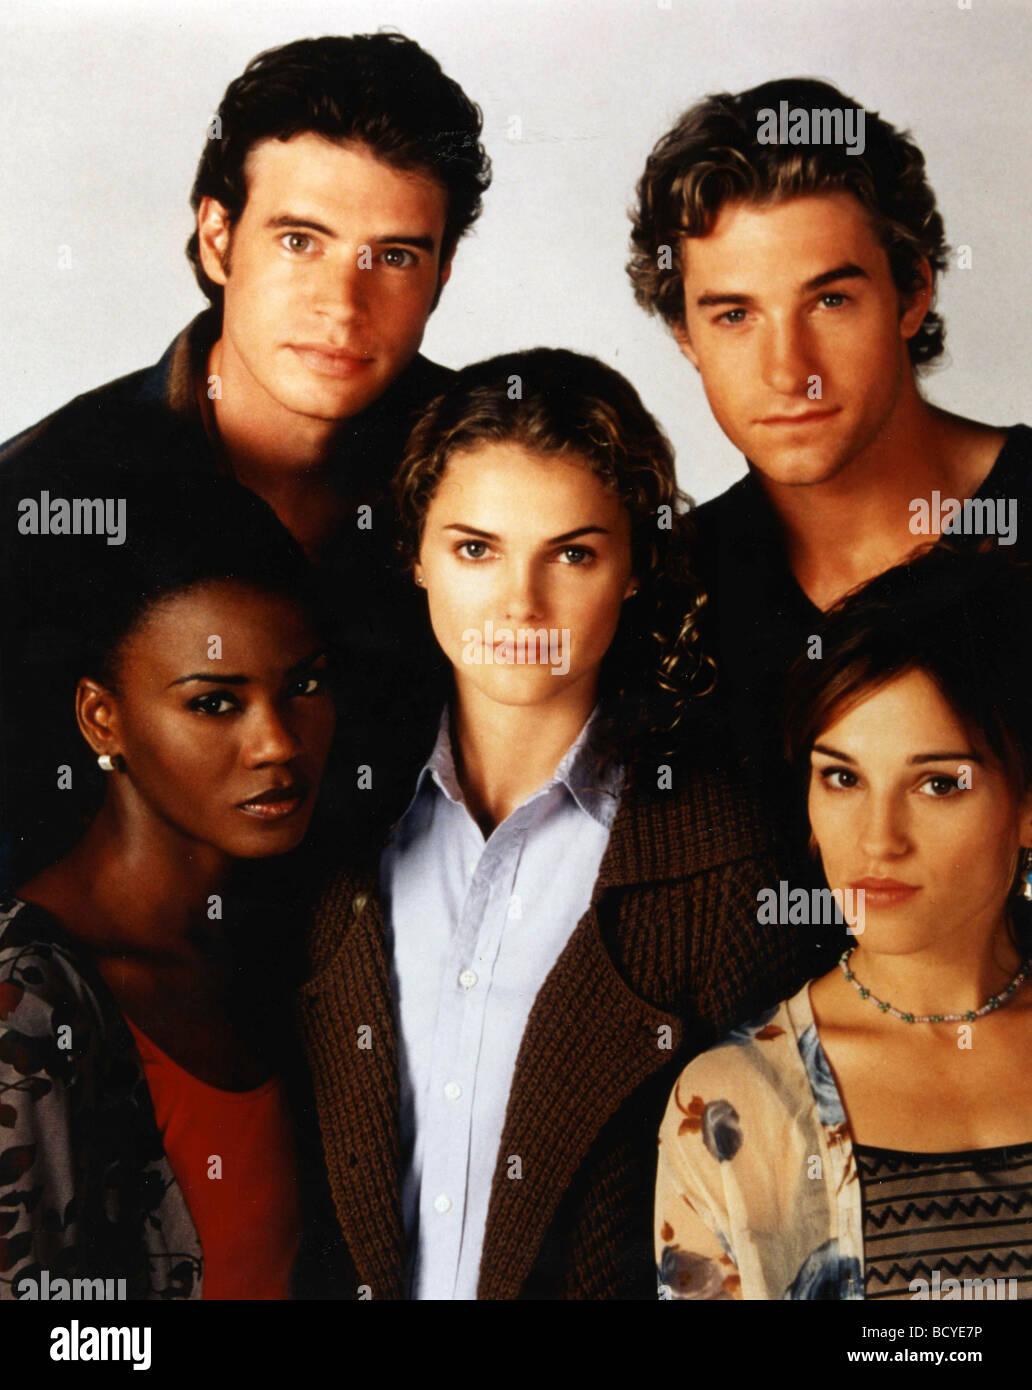 Felicity (TV series ) Year  1998 - 2002 Creator  J.J. Abrams Tangi Miller, Scott Foley, Keri Russel, Scott Speedman, - Stock Image